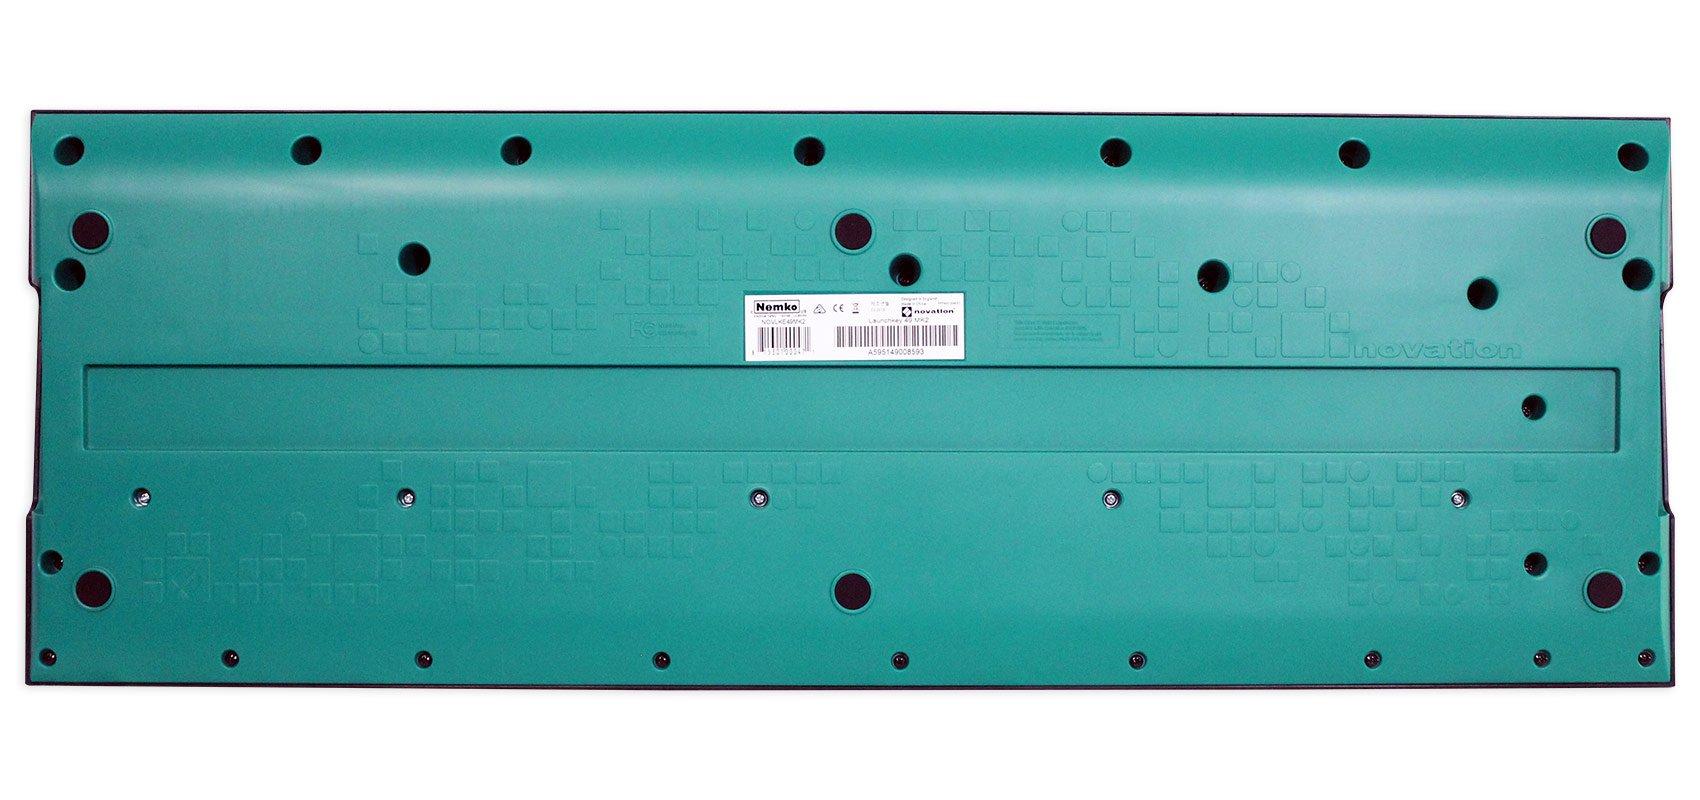 Novation LAUNCHKEY-49-MK2 49-Key USB MIDI Keyboard Controller+Mic+Case+Cable by Novation (Image #4)